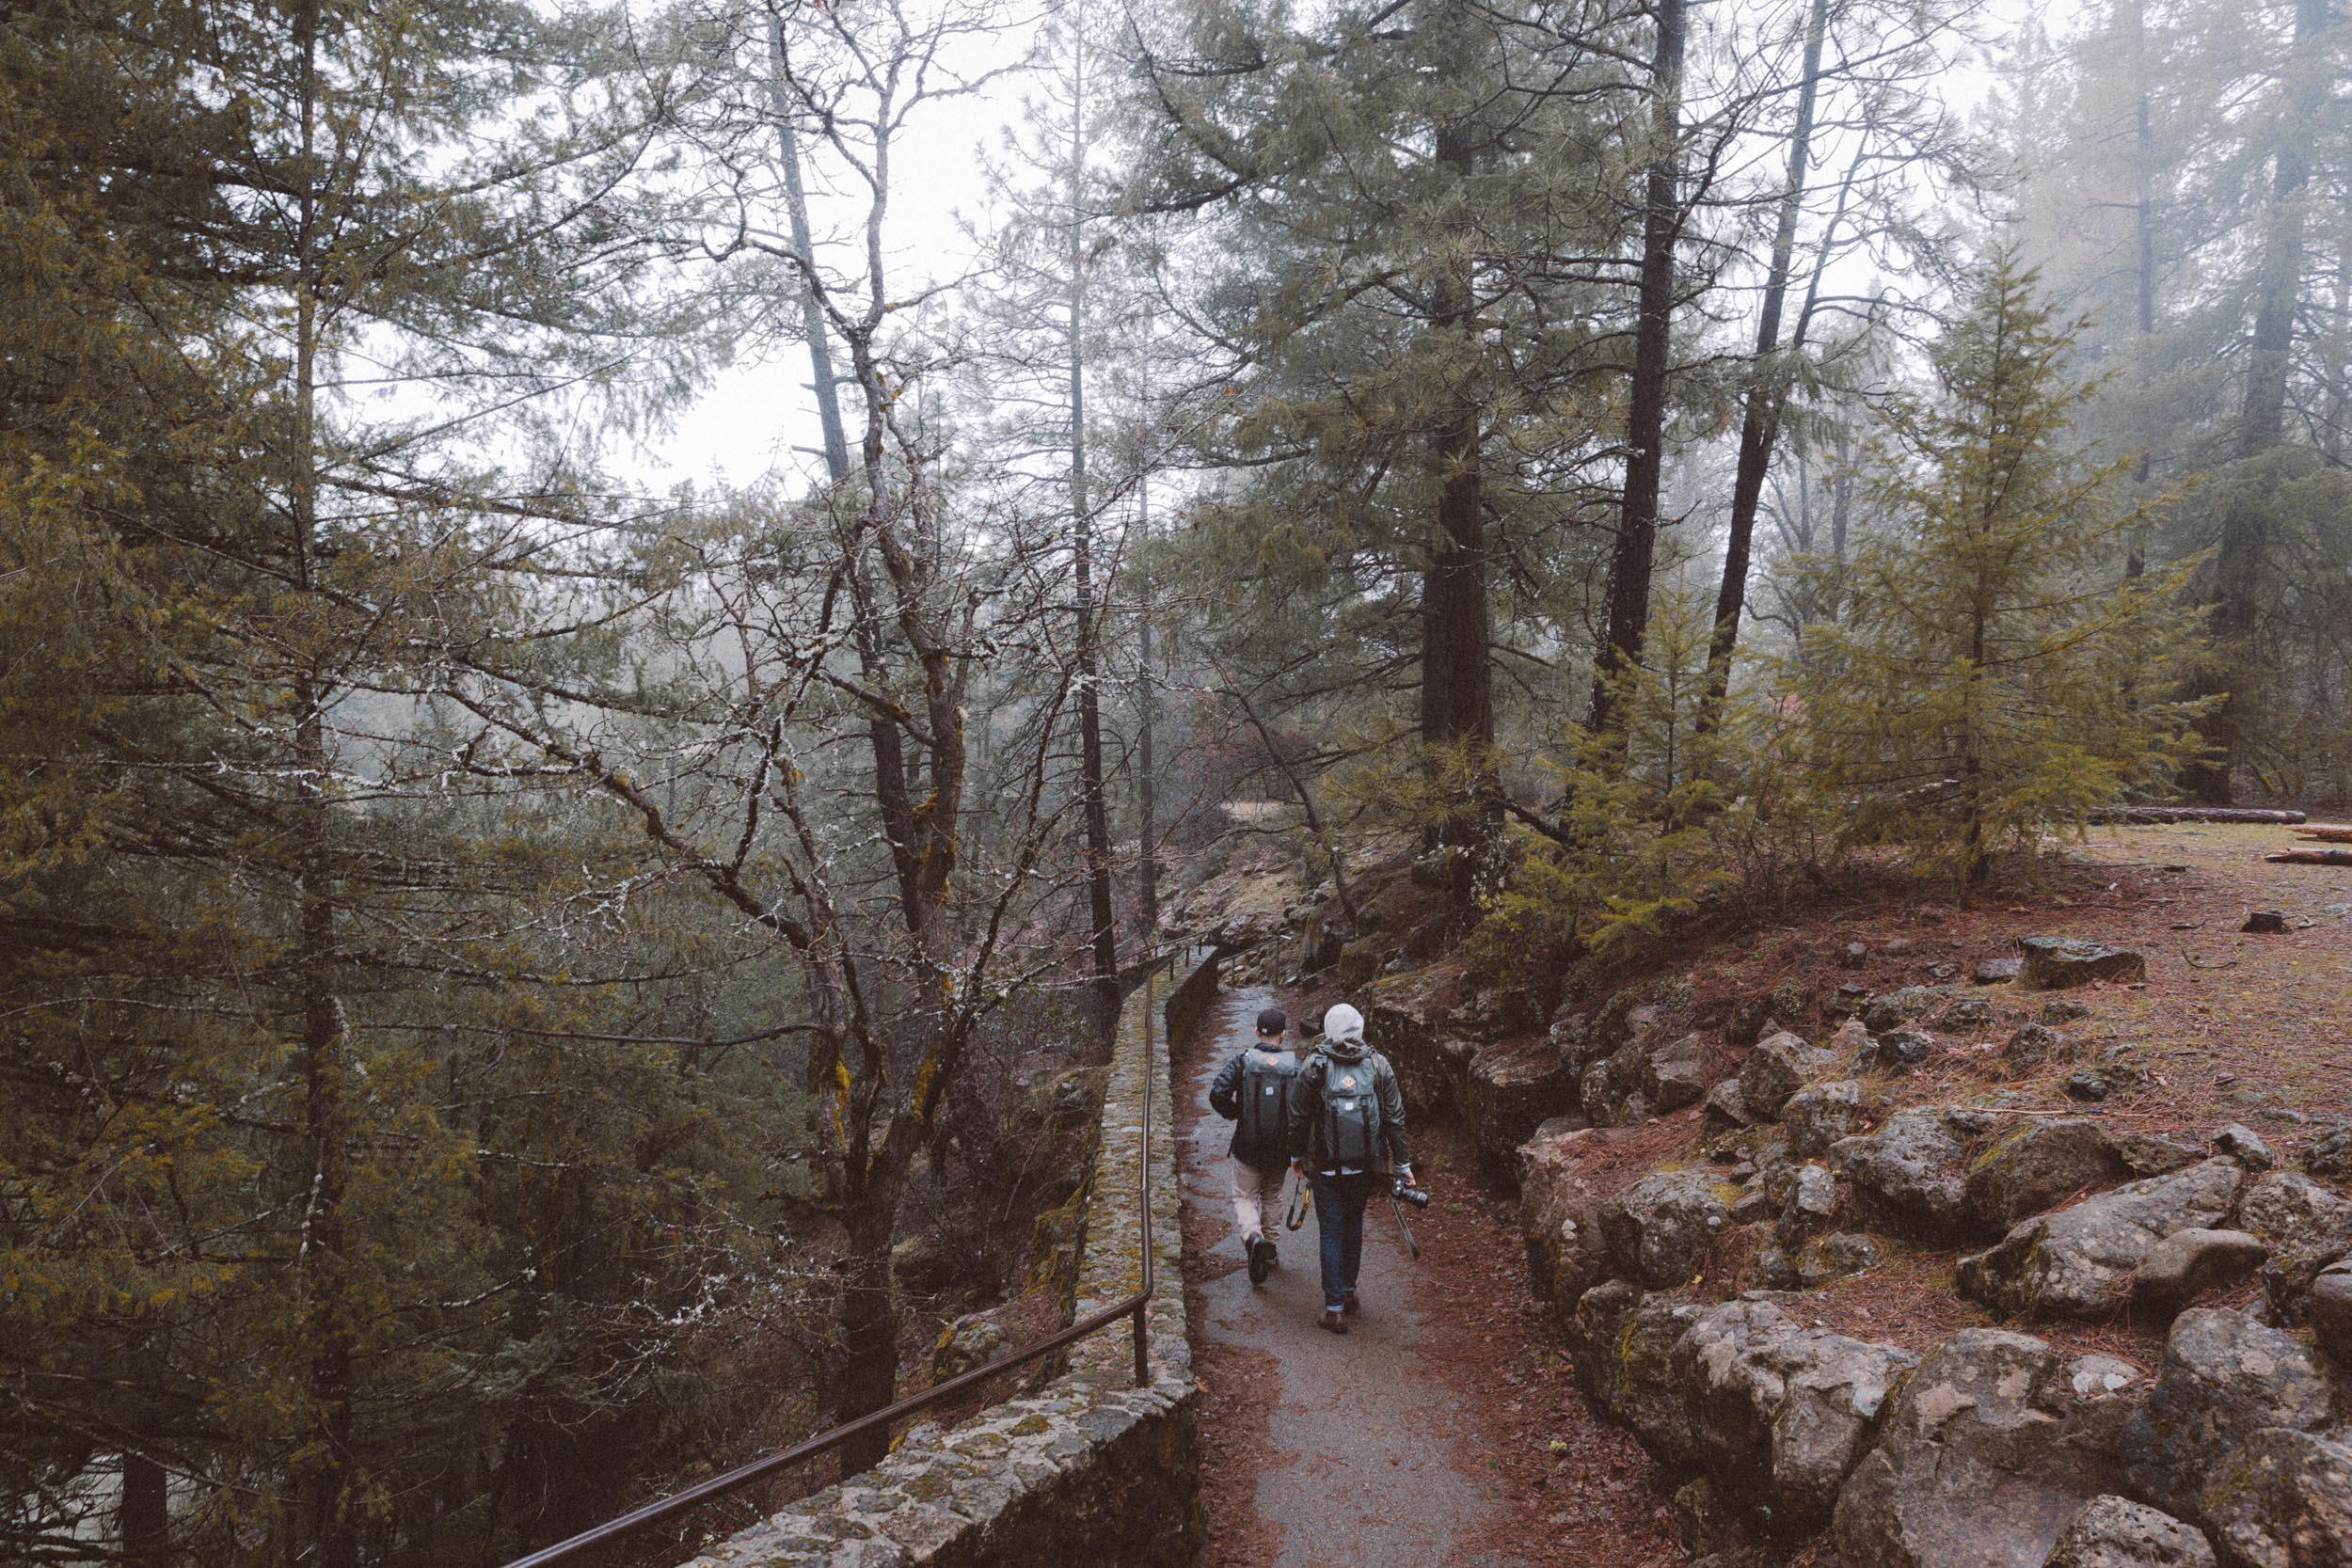 shasta-adventure-burney-falls-trail-hike-and-shoot-1.jpg